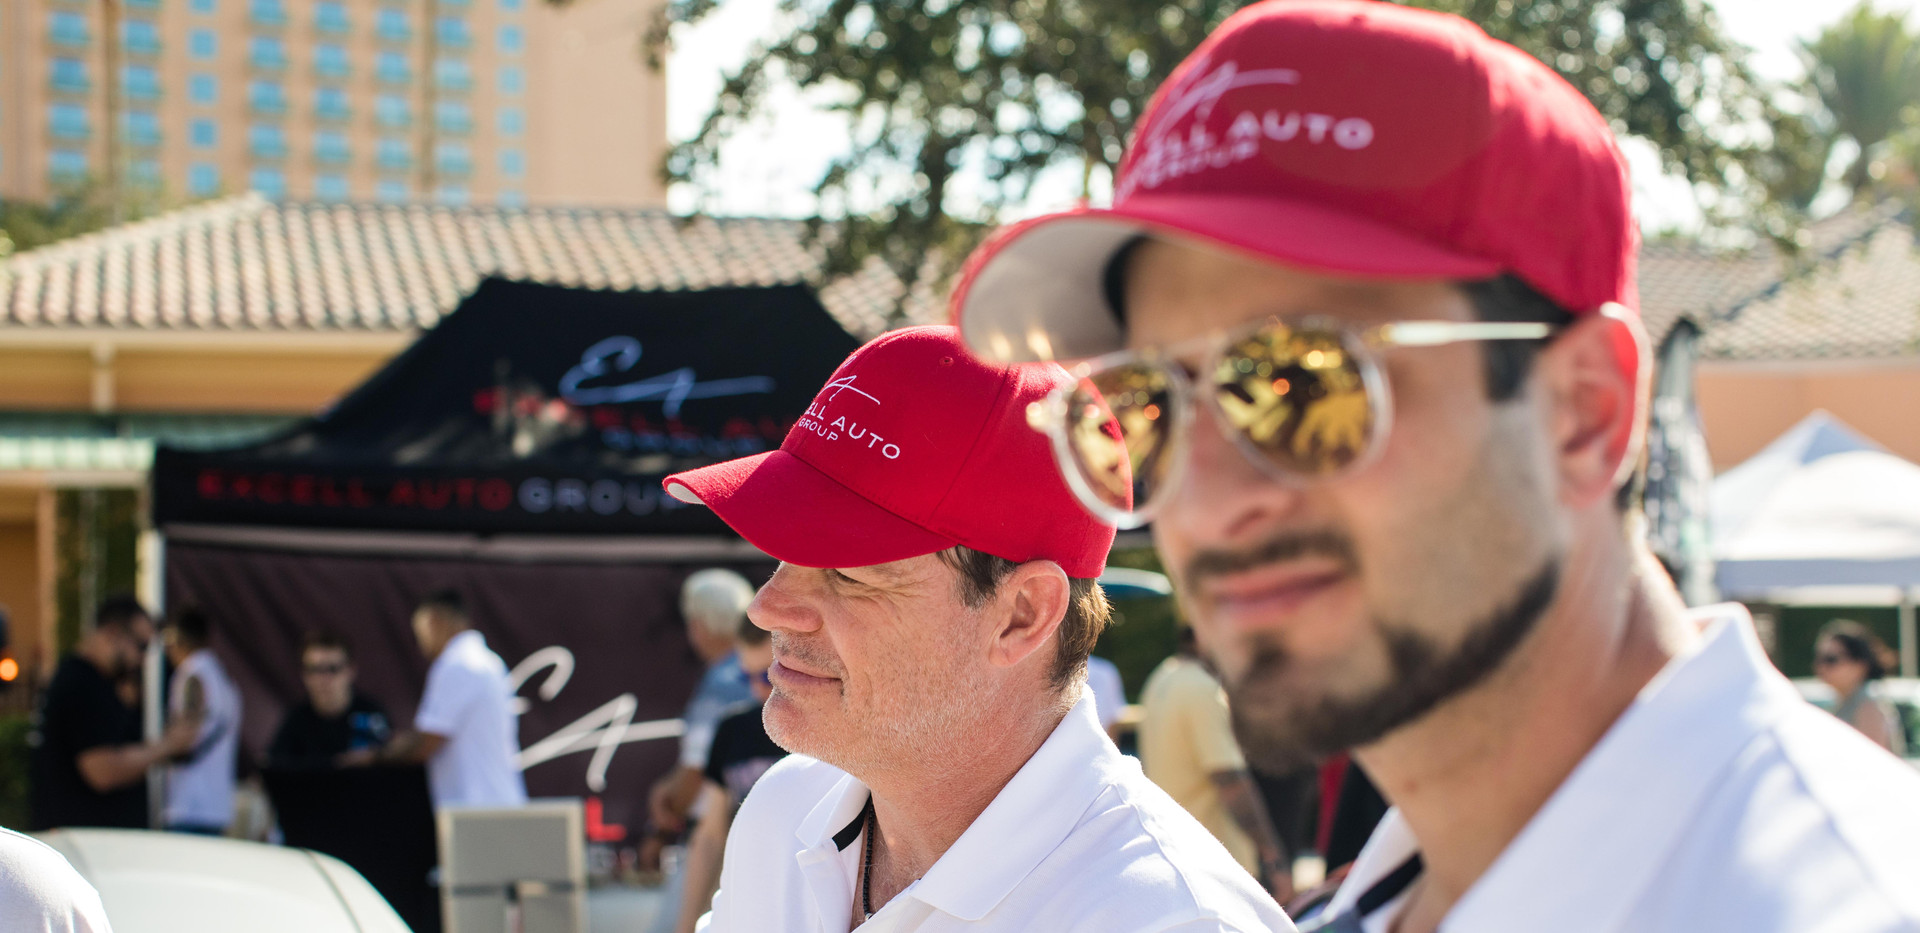 2018_FOS_Orlando-44.jpg